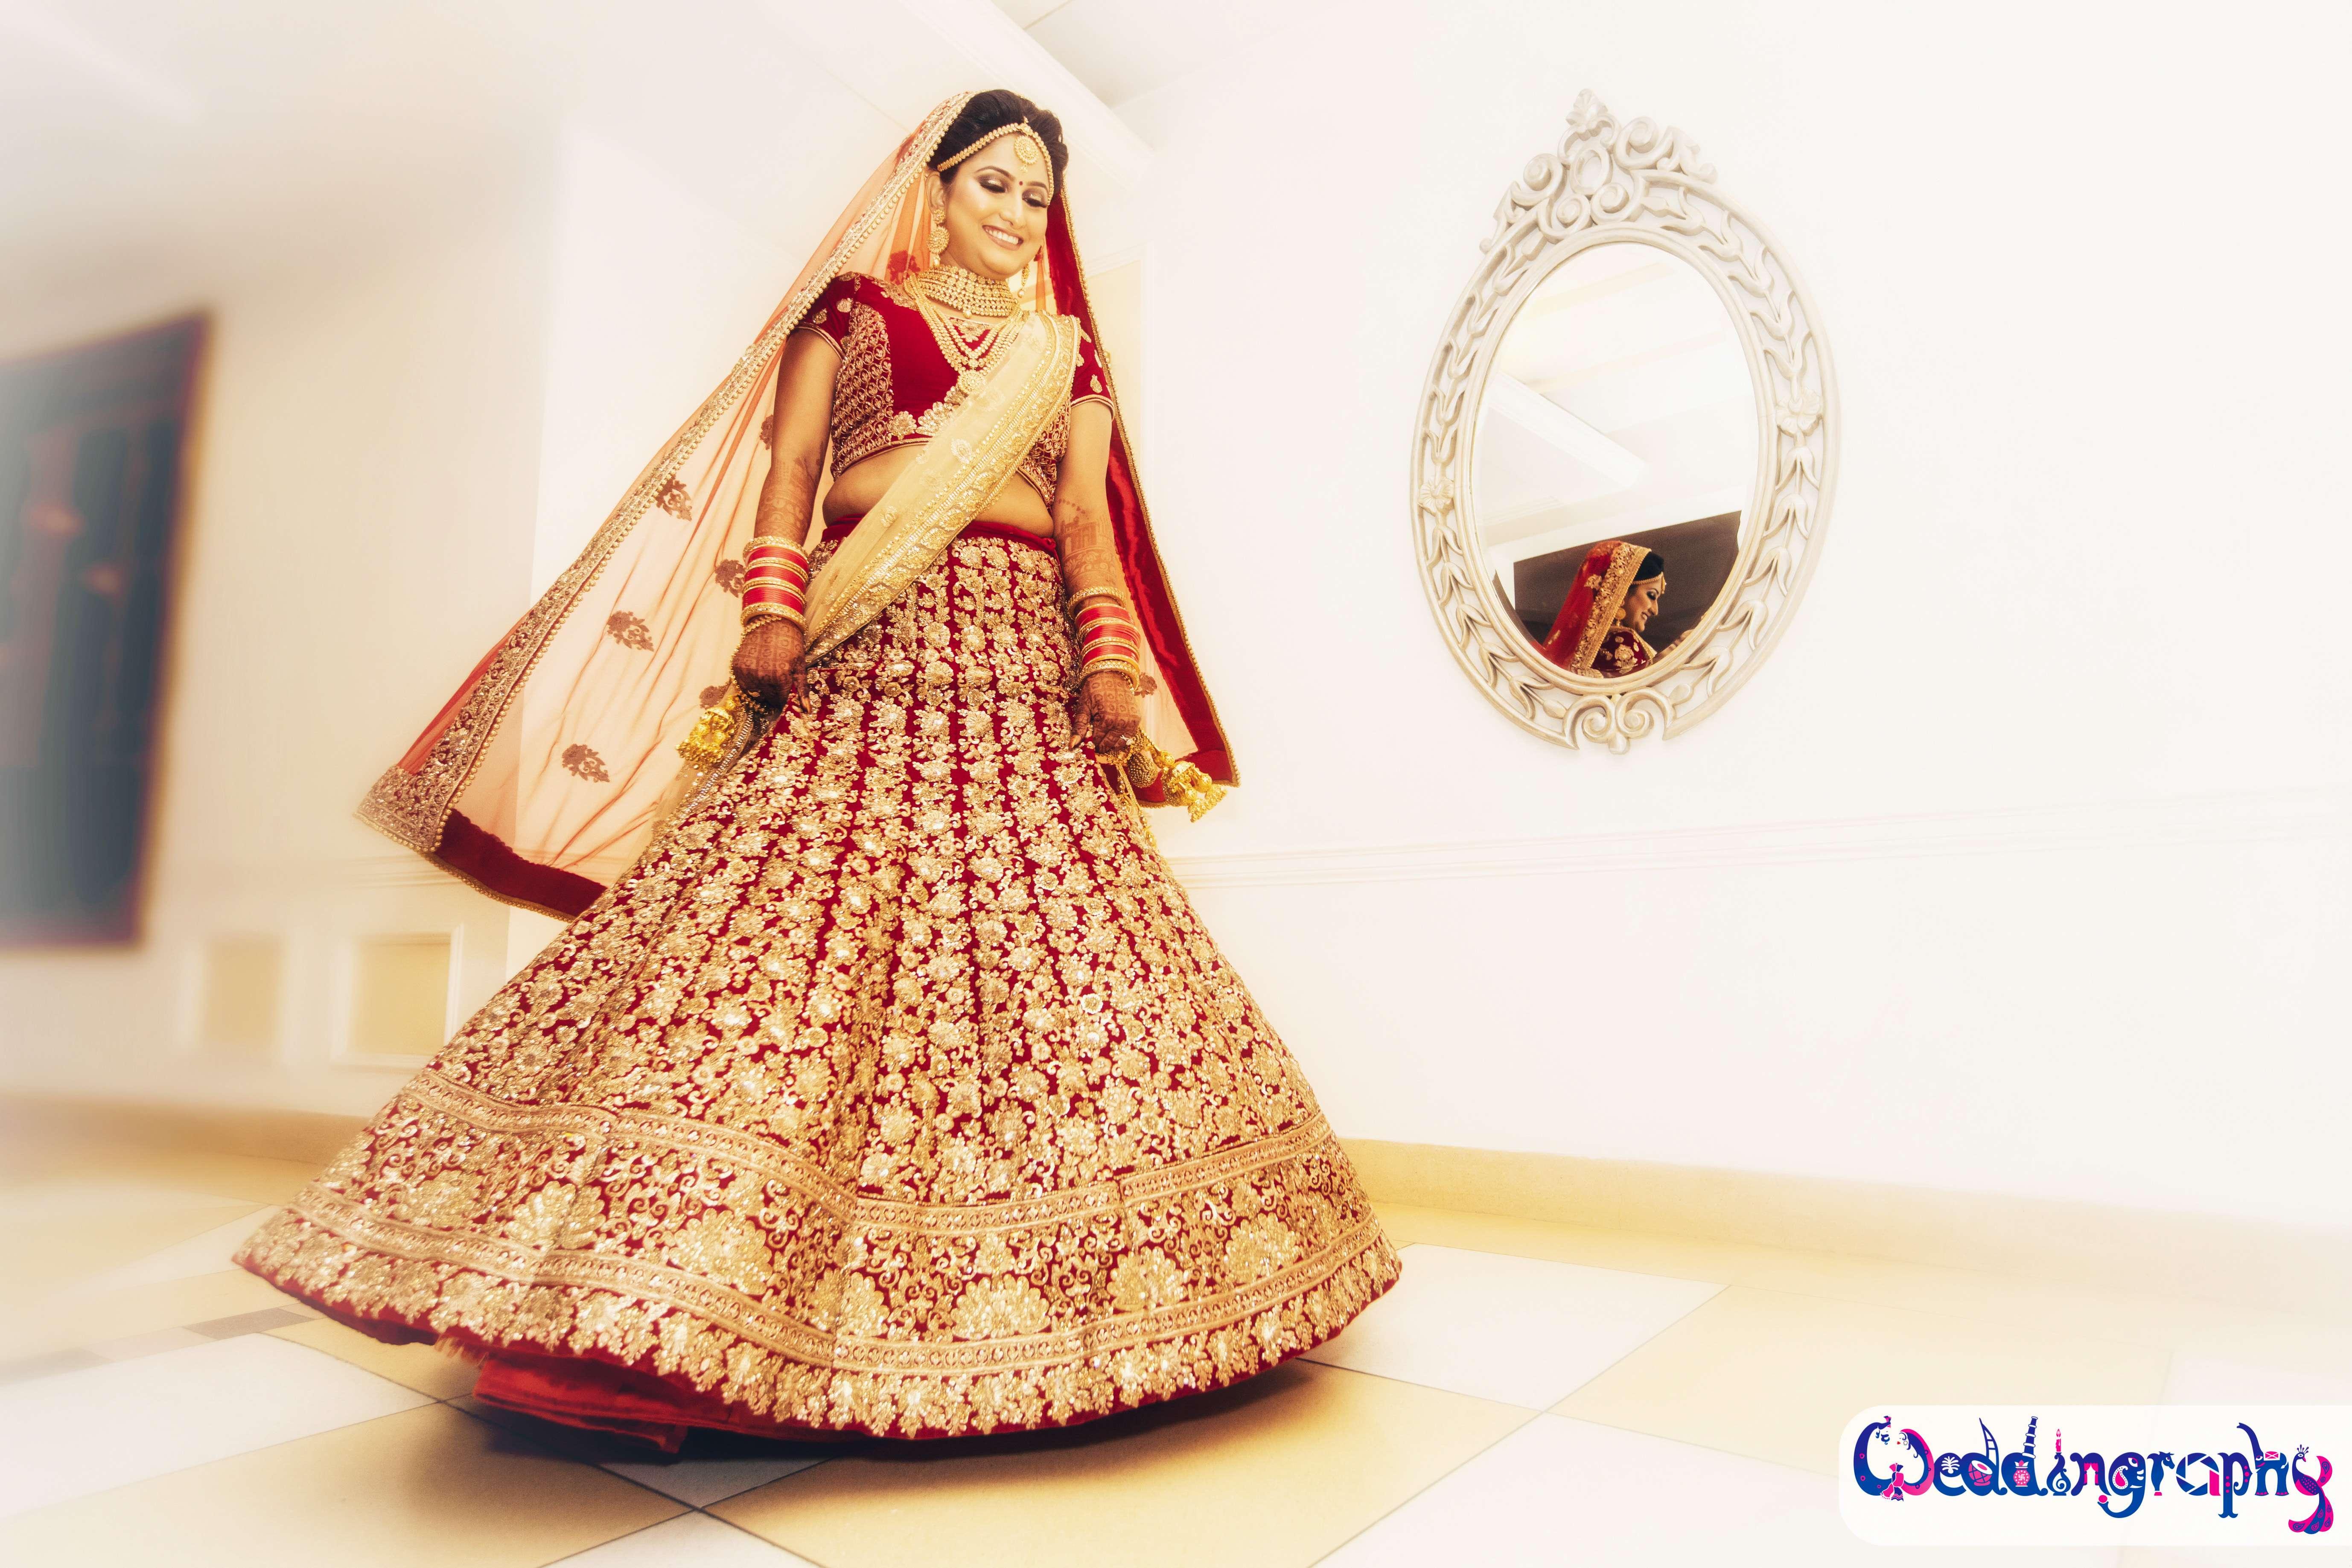 Weddingraphy - Portfolio